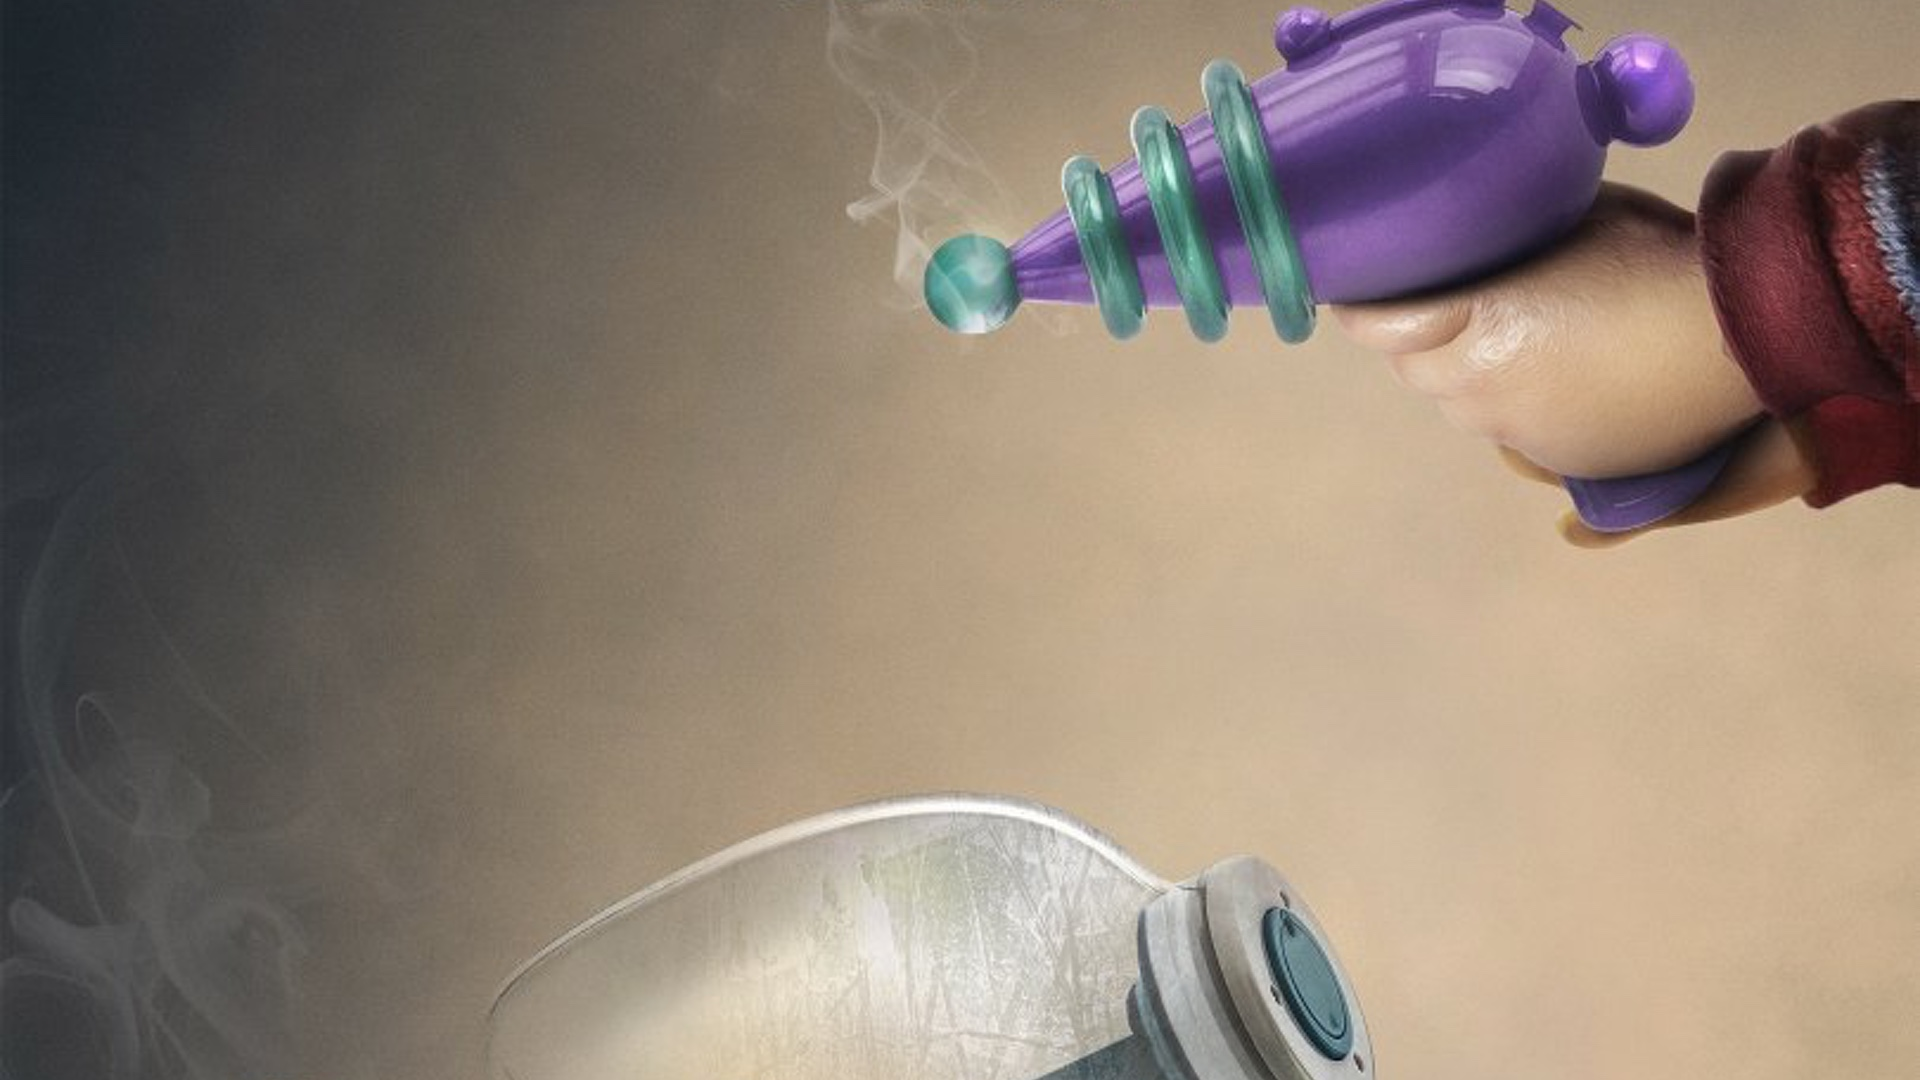 Chucky continúa 'masacrando' personajes de Toy Story 4 de Disney